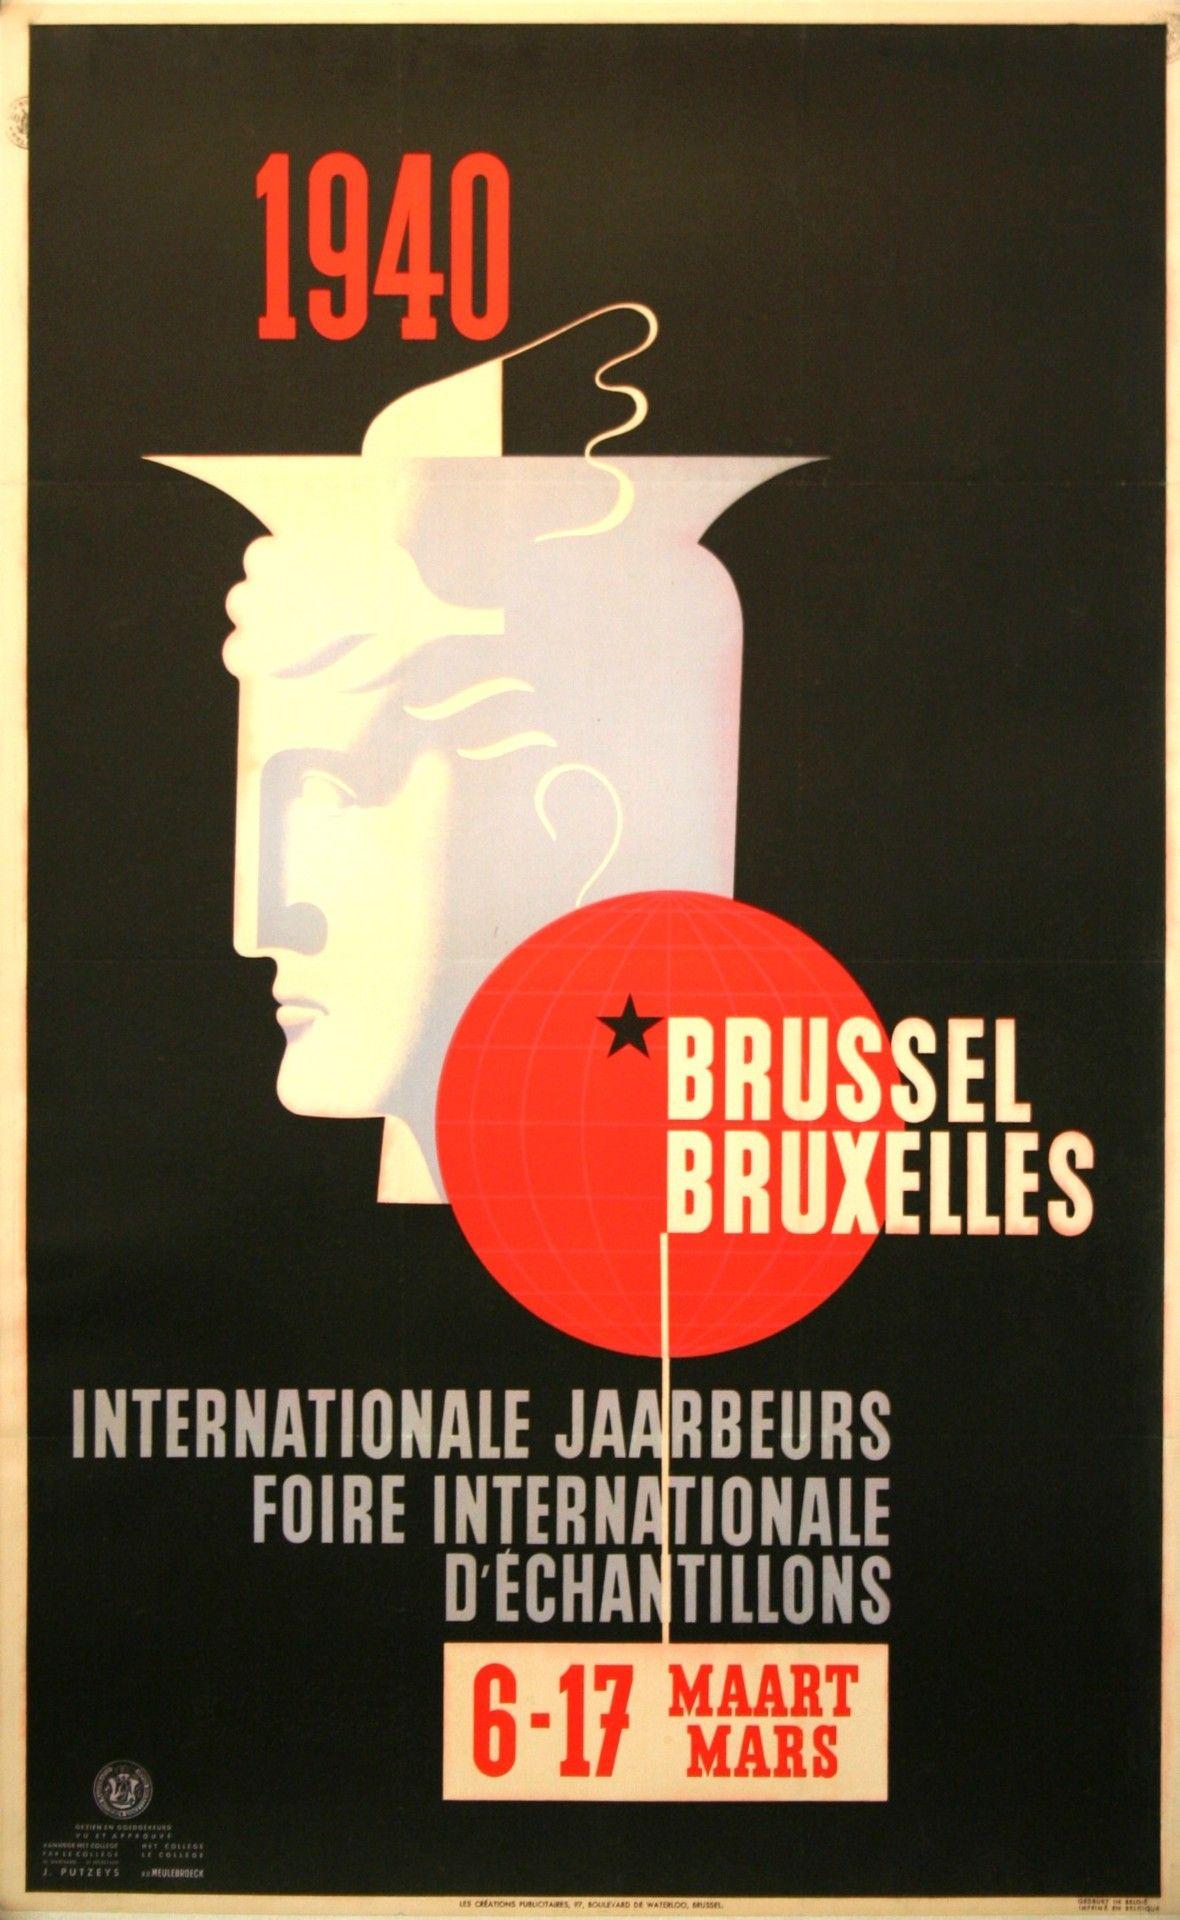 Poster design 1940 - Jaarbeurs Foire Commerciale Bruxelles Brussel 1940 Poster By Leo Marfurt